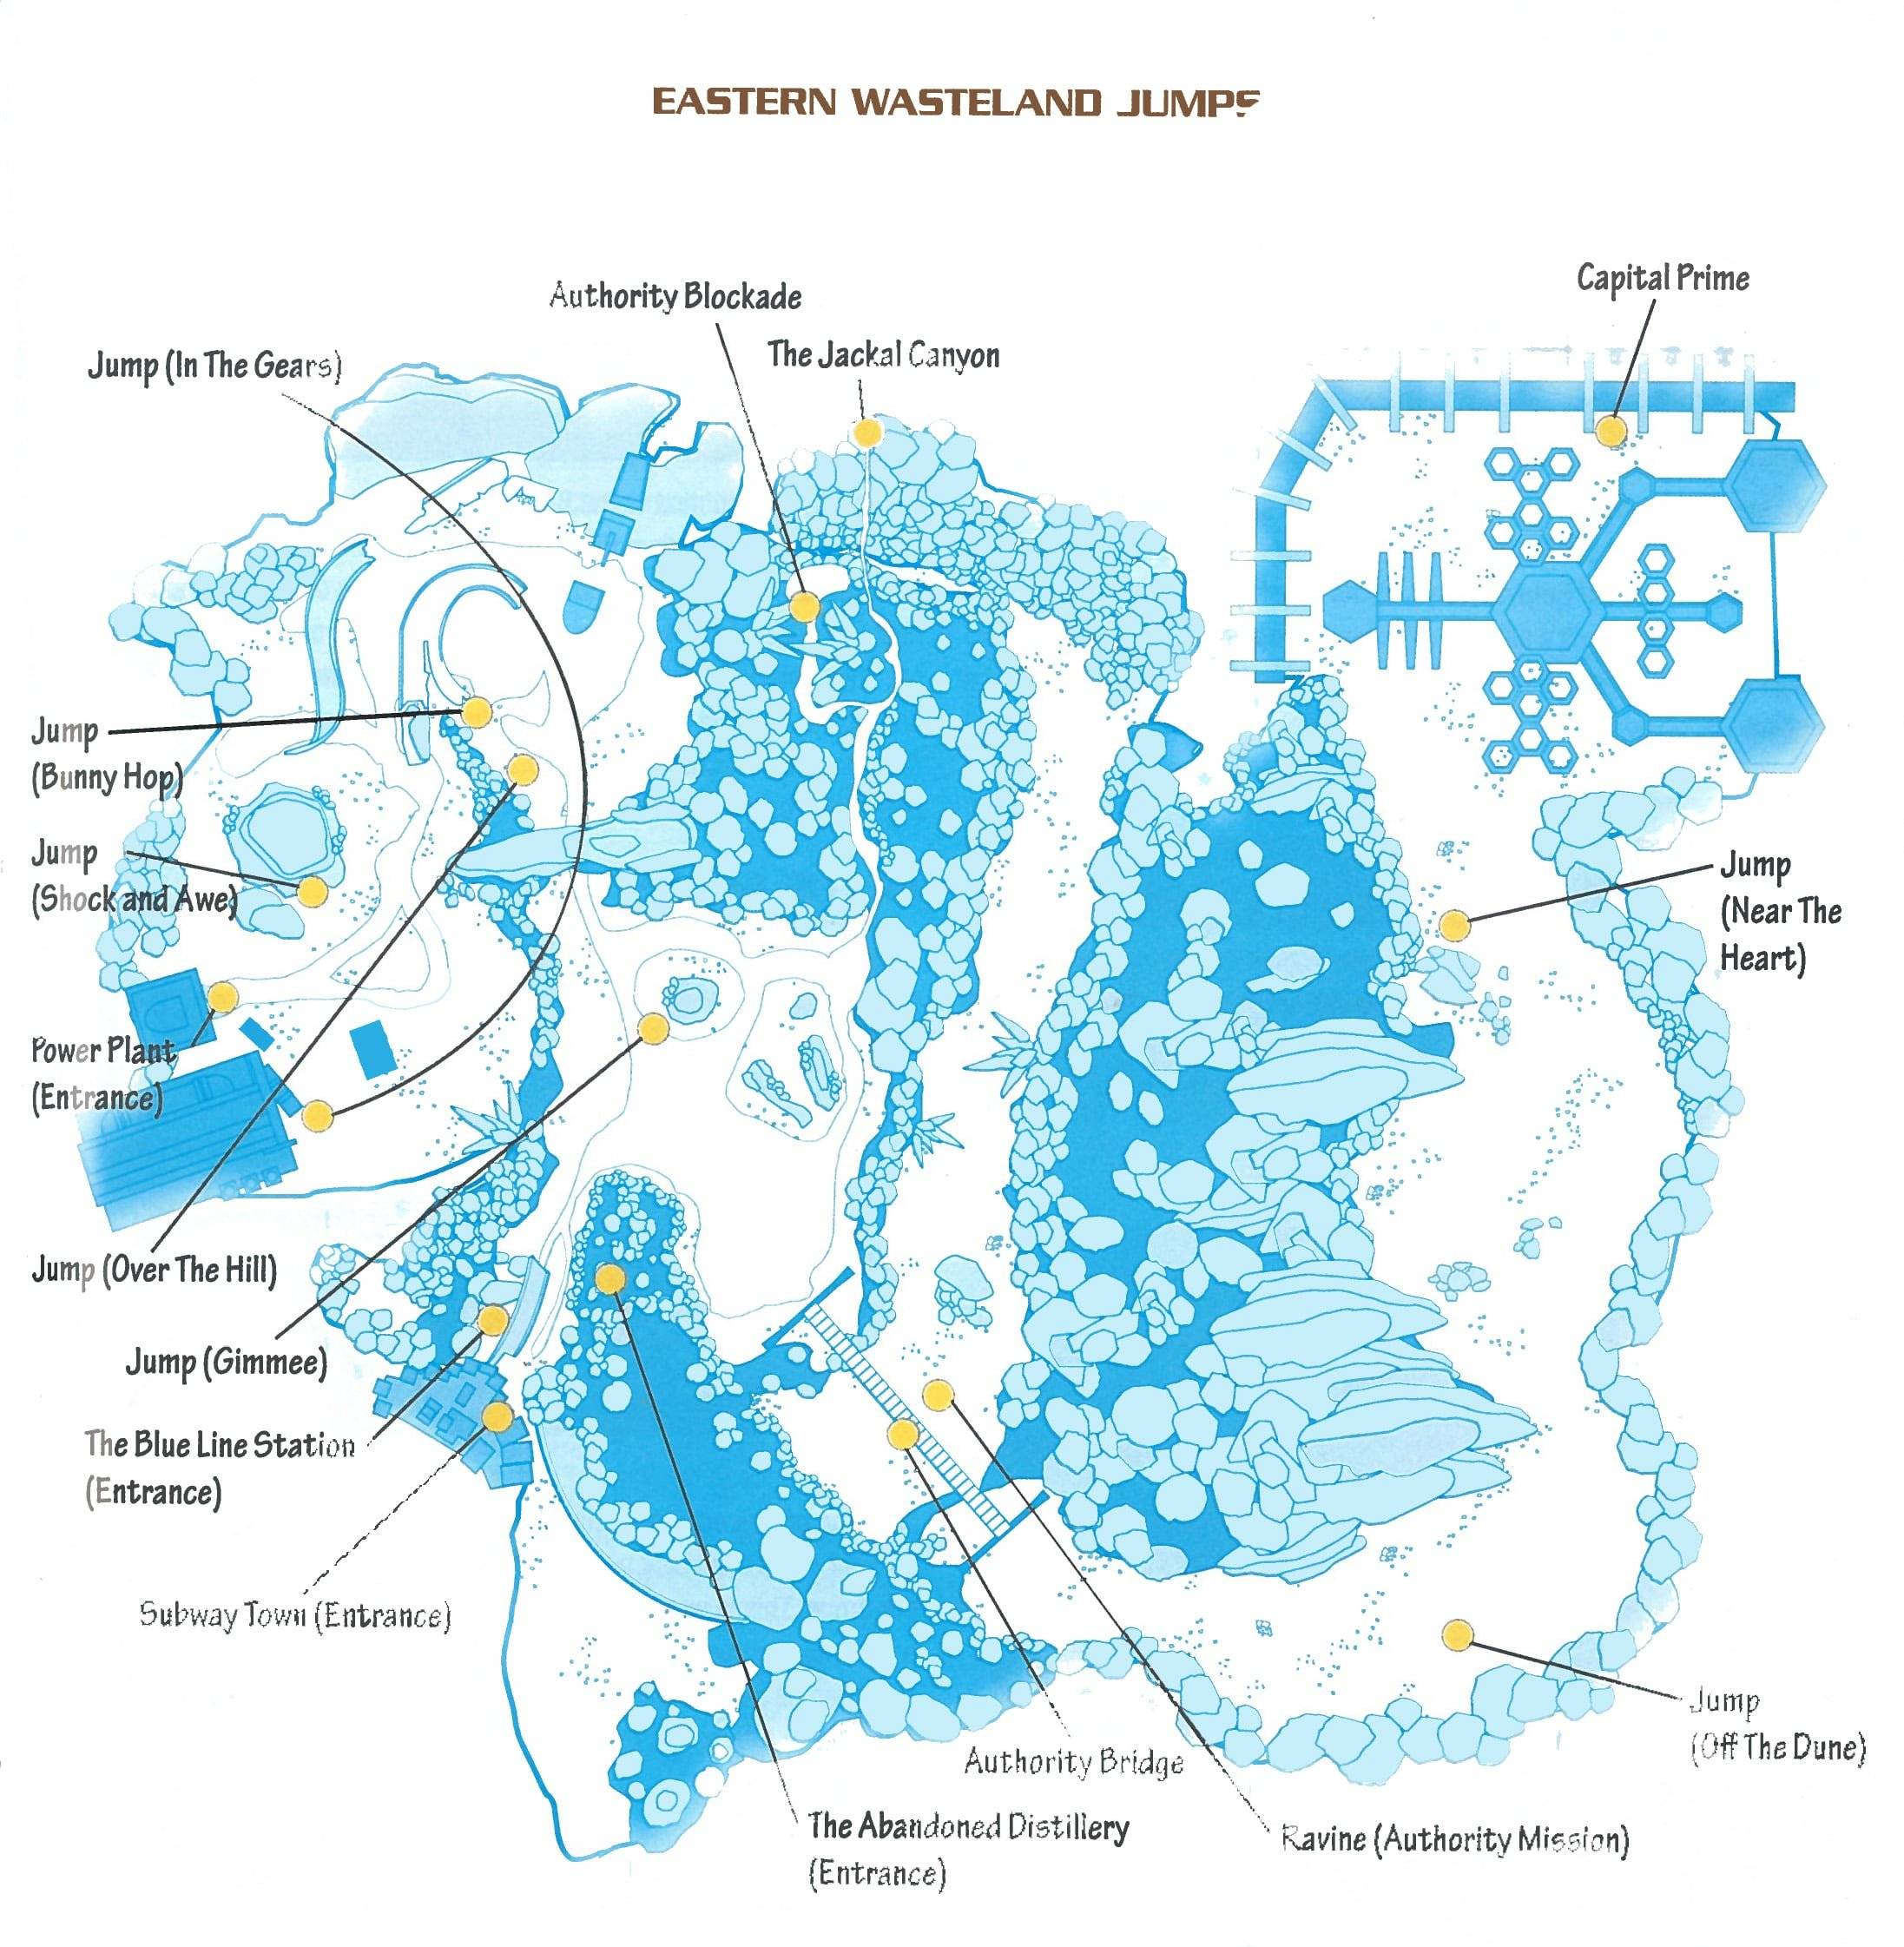 Jumps - Eastern Wasteland